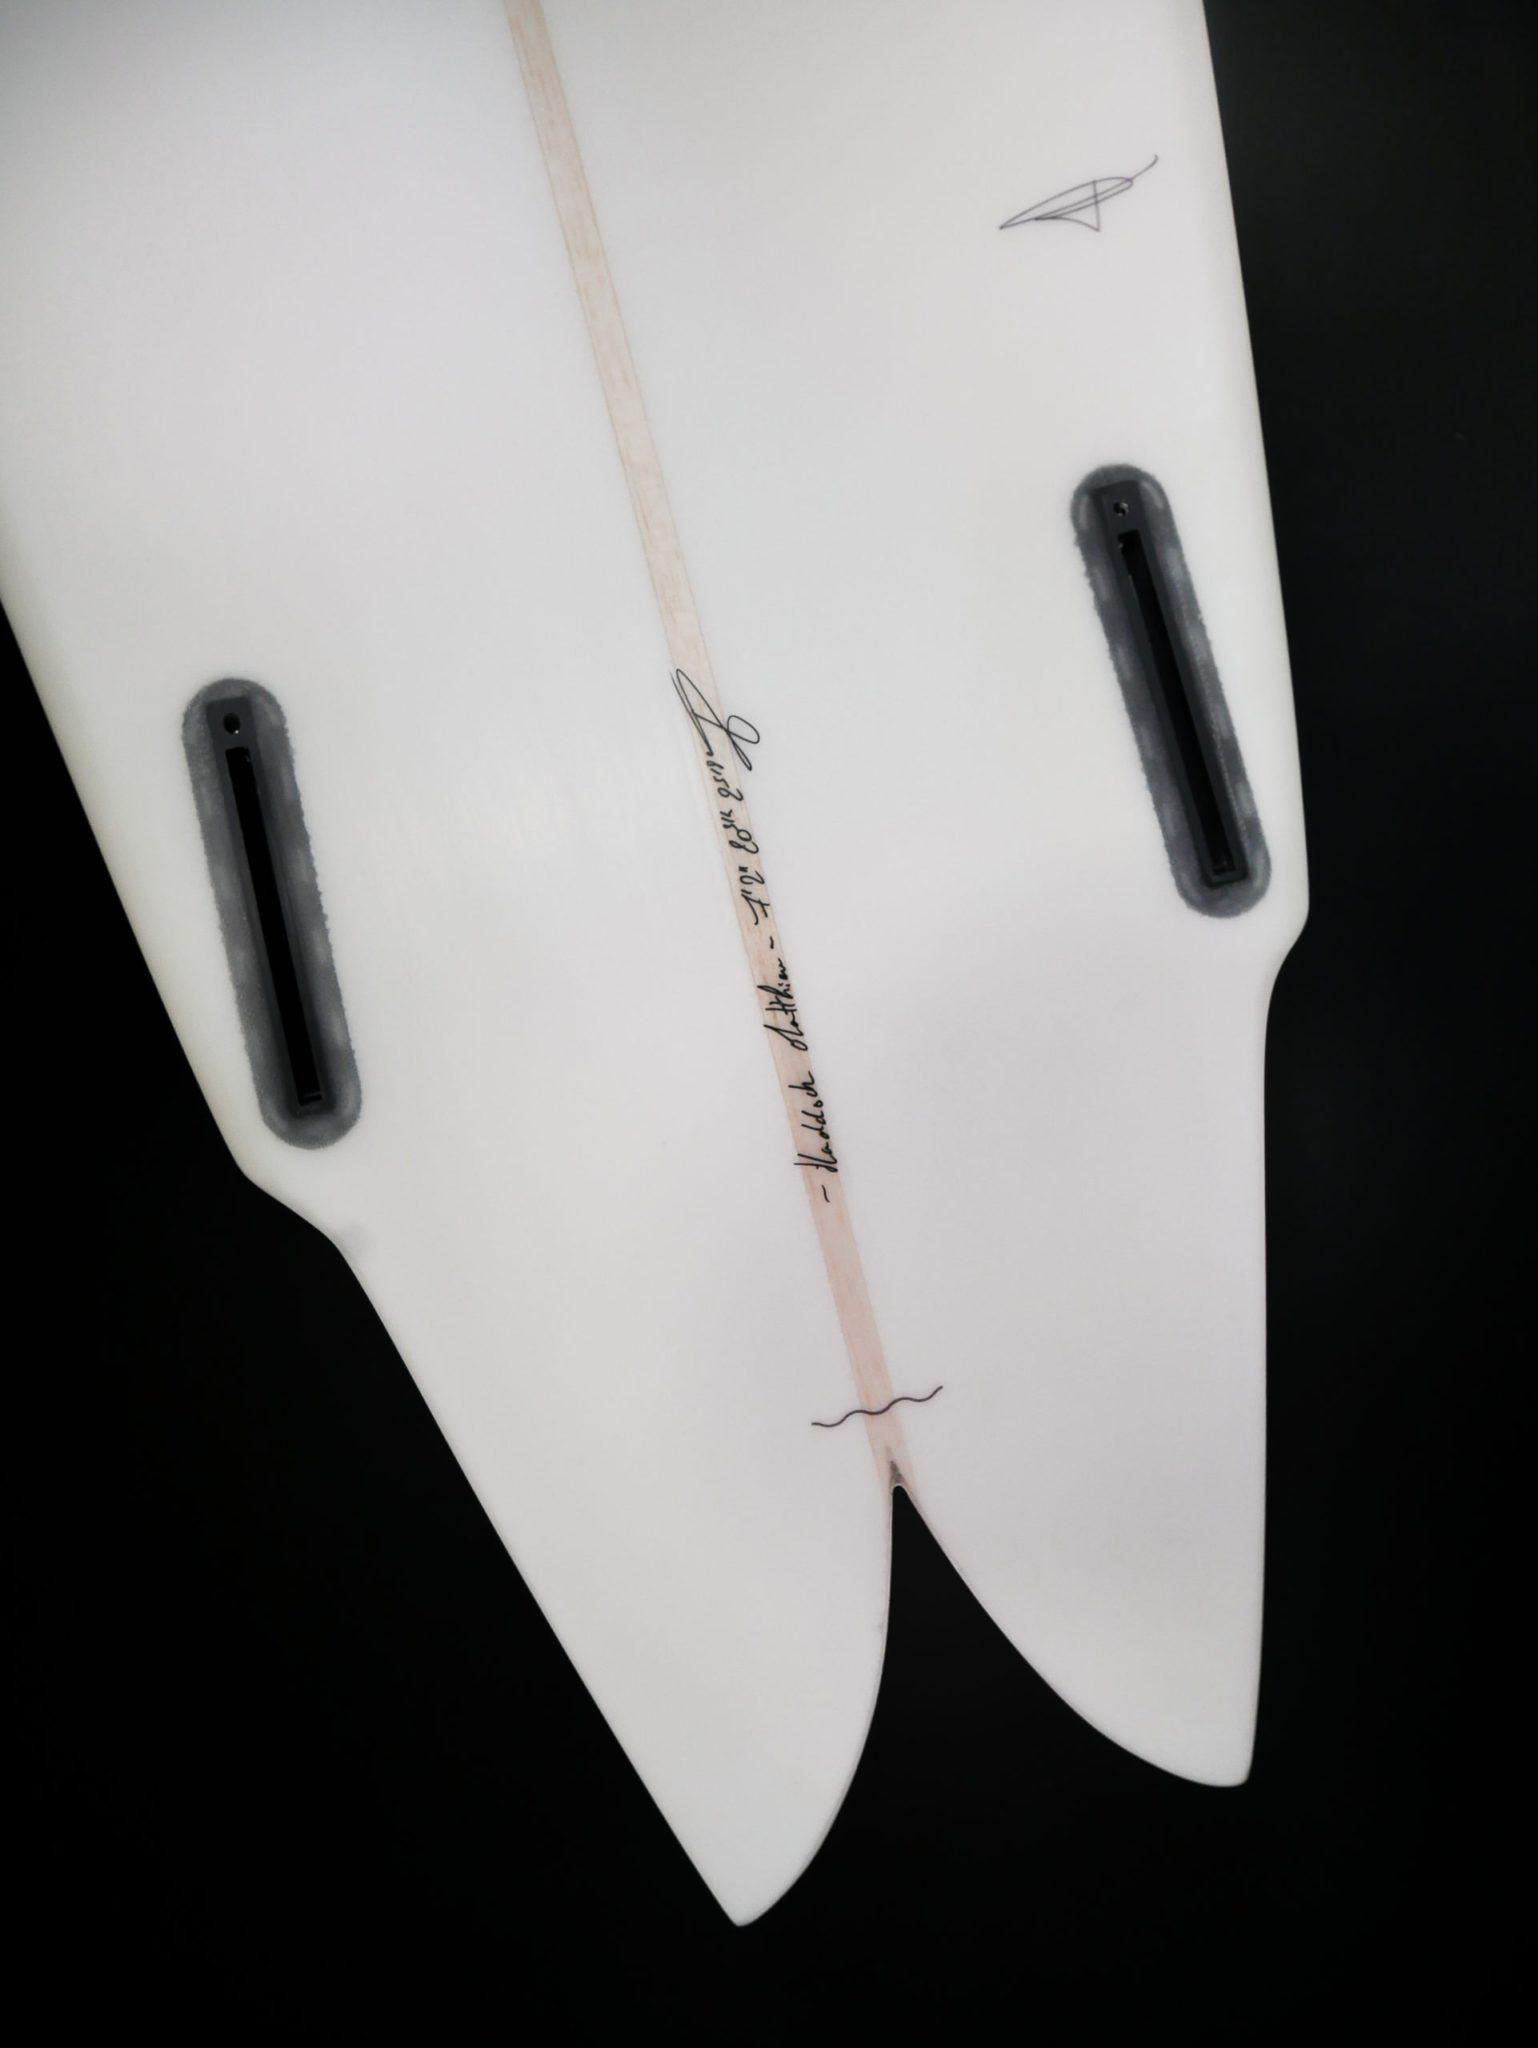 Cachalot Surfboards planche surf handmade artisan shaper hollow bois eps haddock